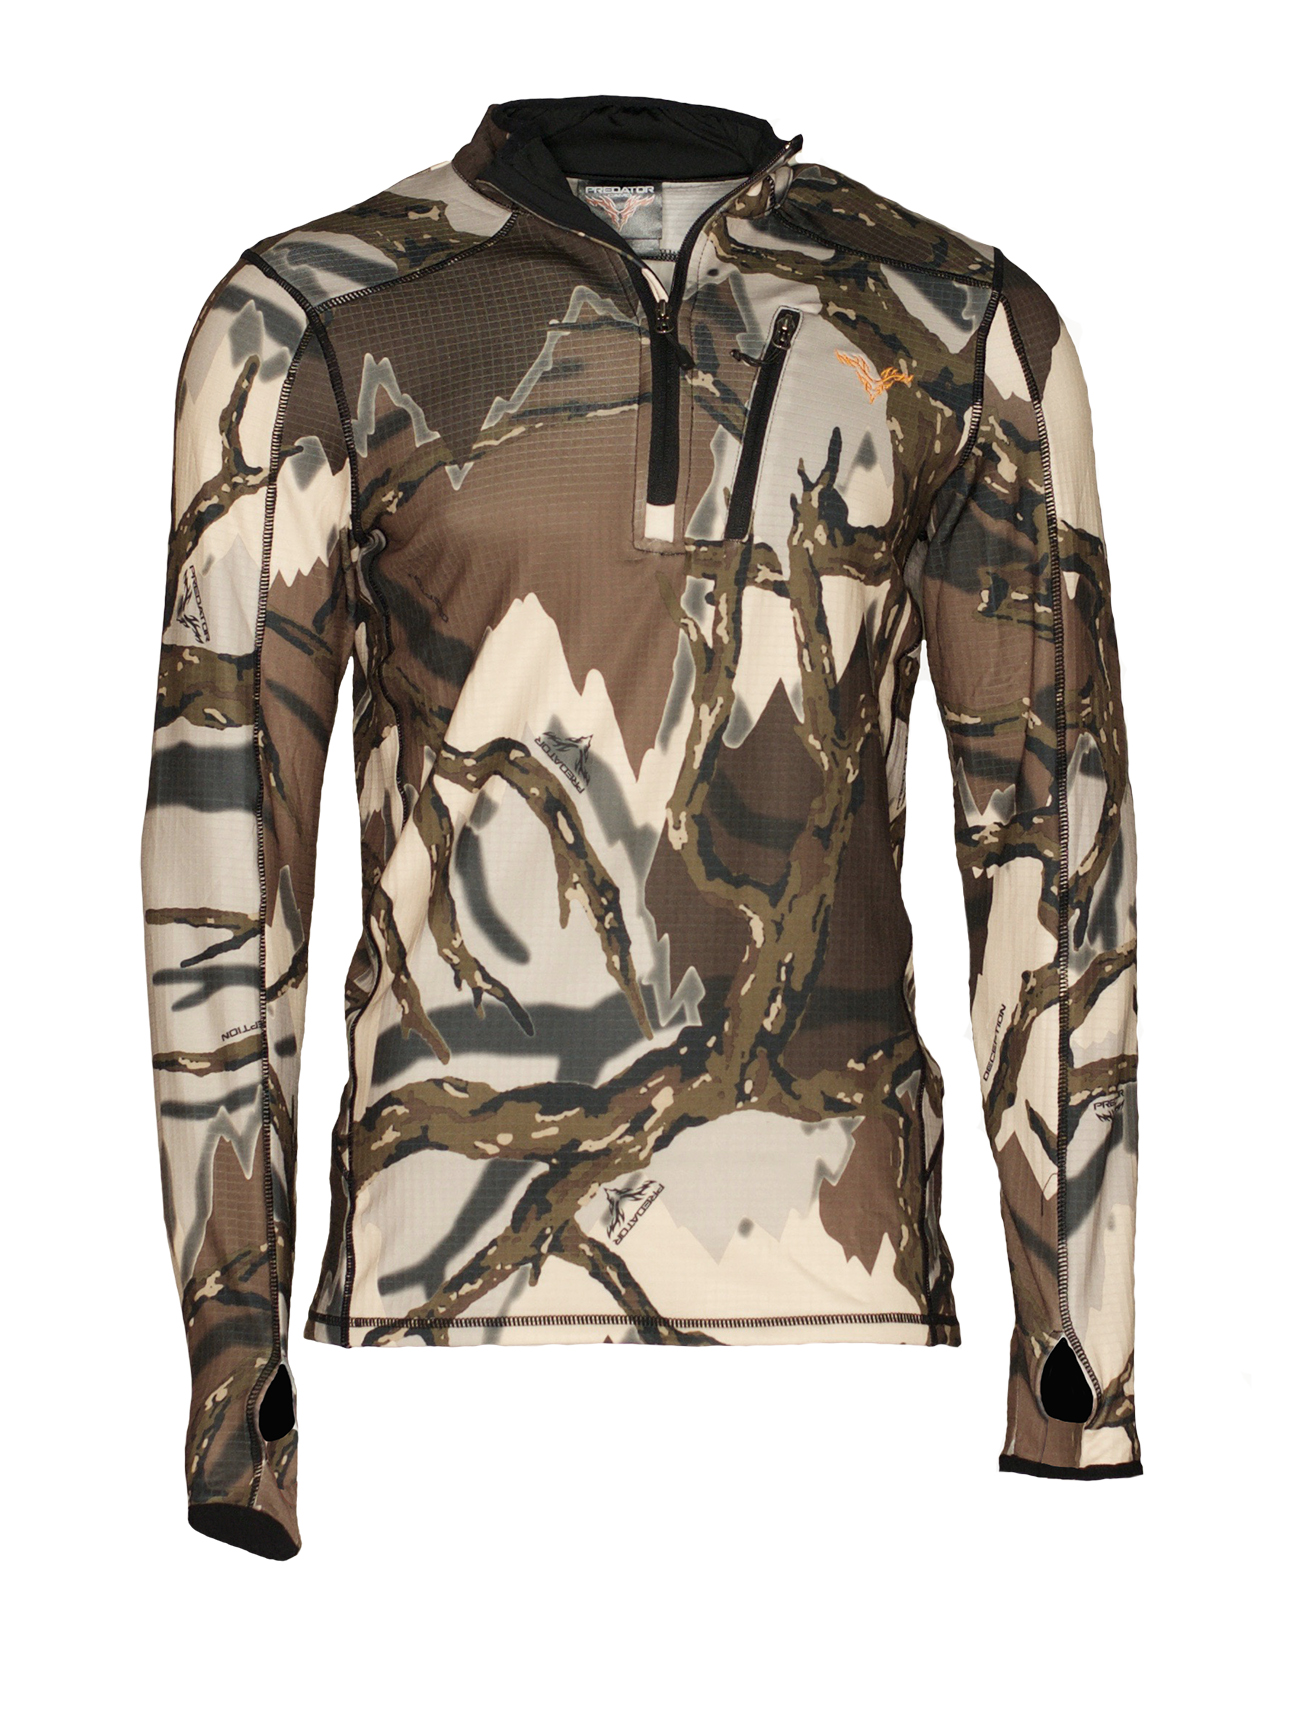 Predator Camo Fleece mikina 1 4 zip Barva  brown deception 6bbbaab9f4